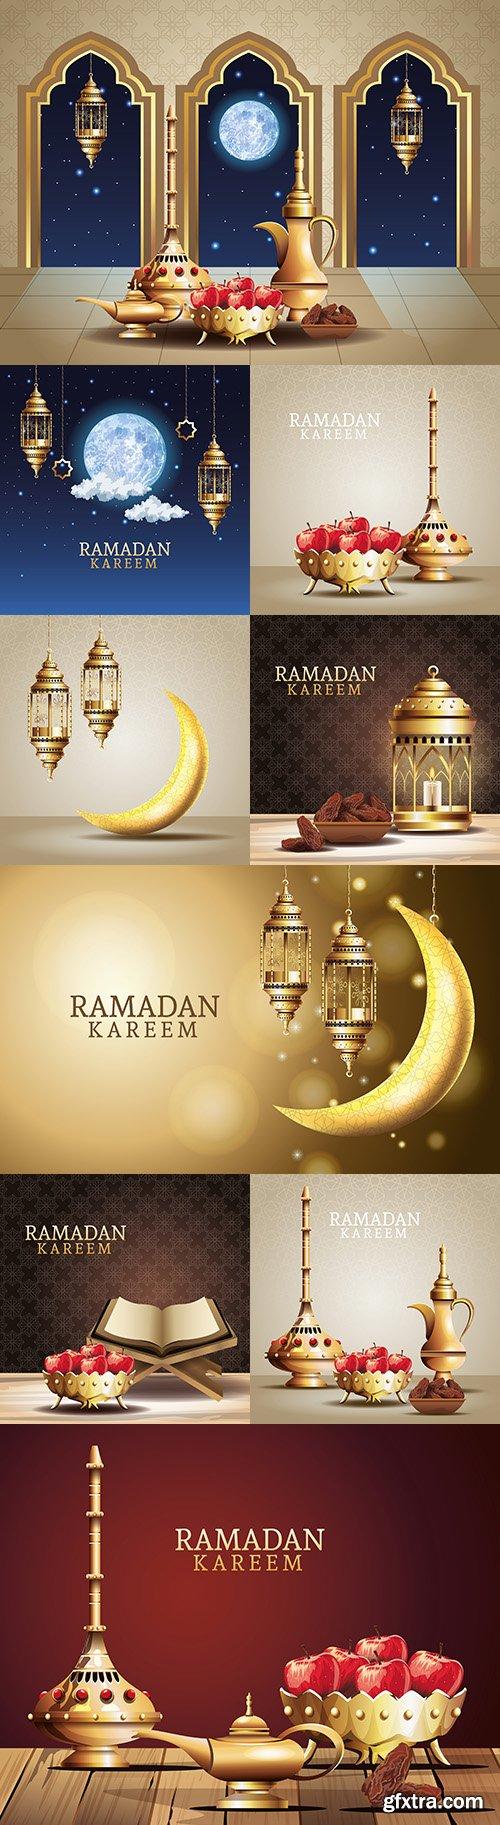 Holiday Ramadan Kareem with gold lights illustration